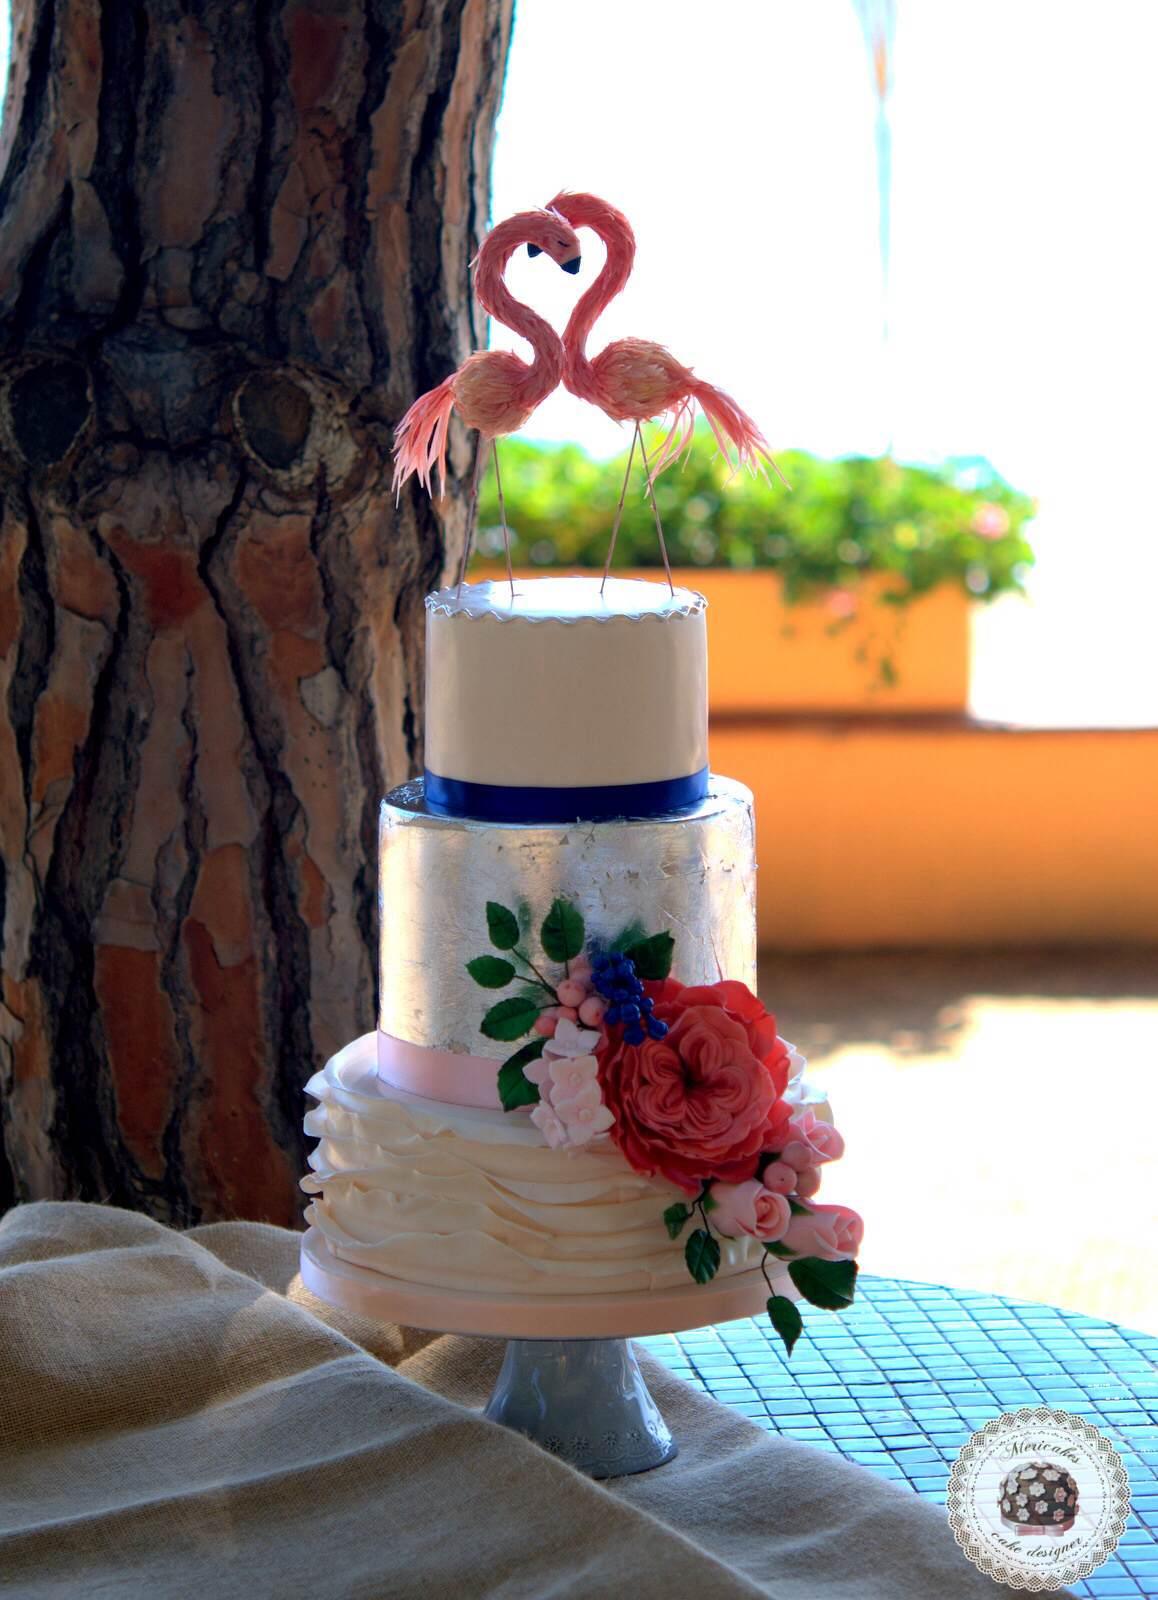 flamingo-love-flamencos-wedding-cake-costa-brava-bodas-reales-mericakes-barcelona-tarta-de-boda-luxury-weddingcake-3